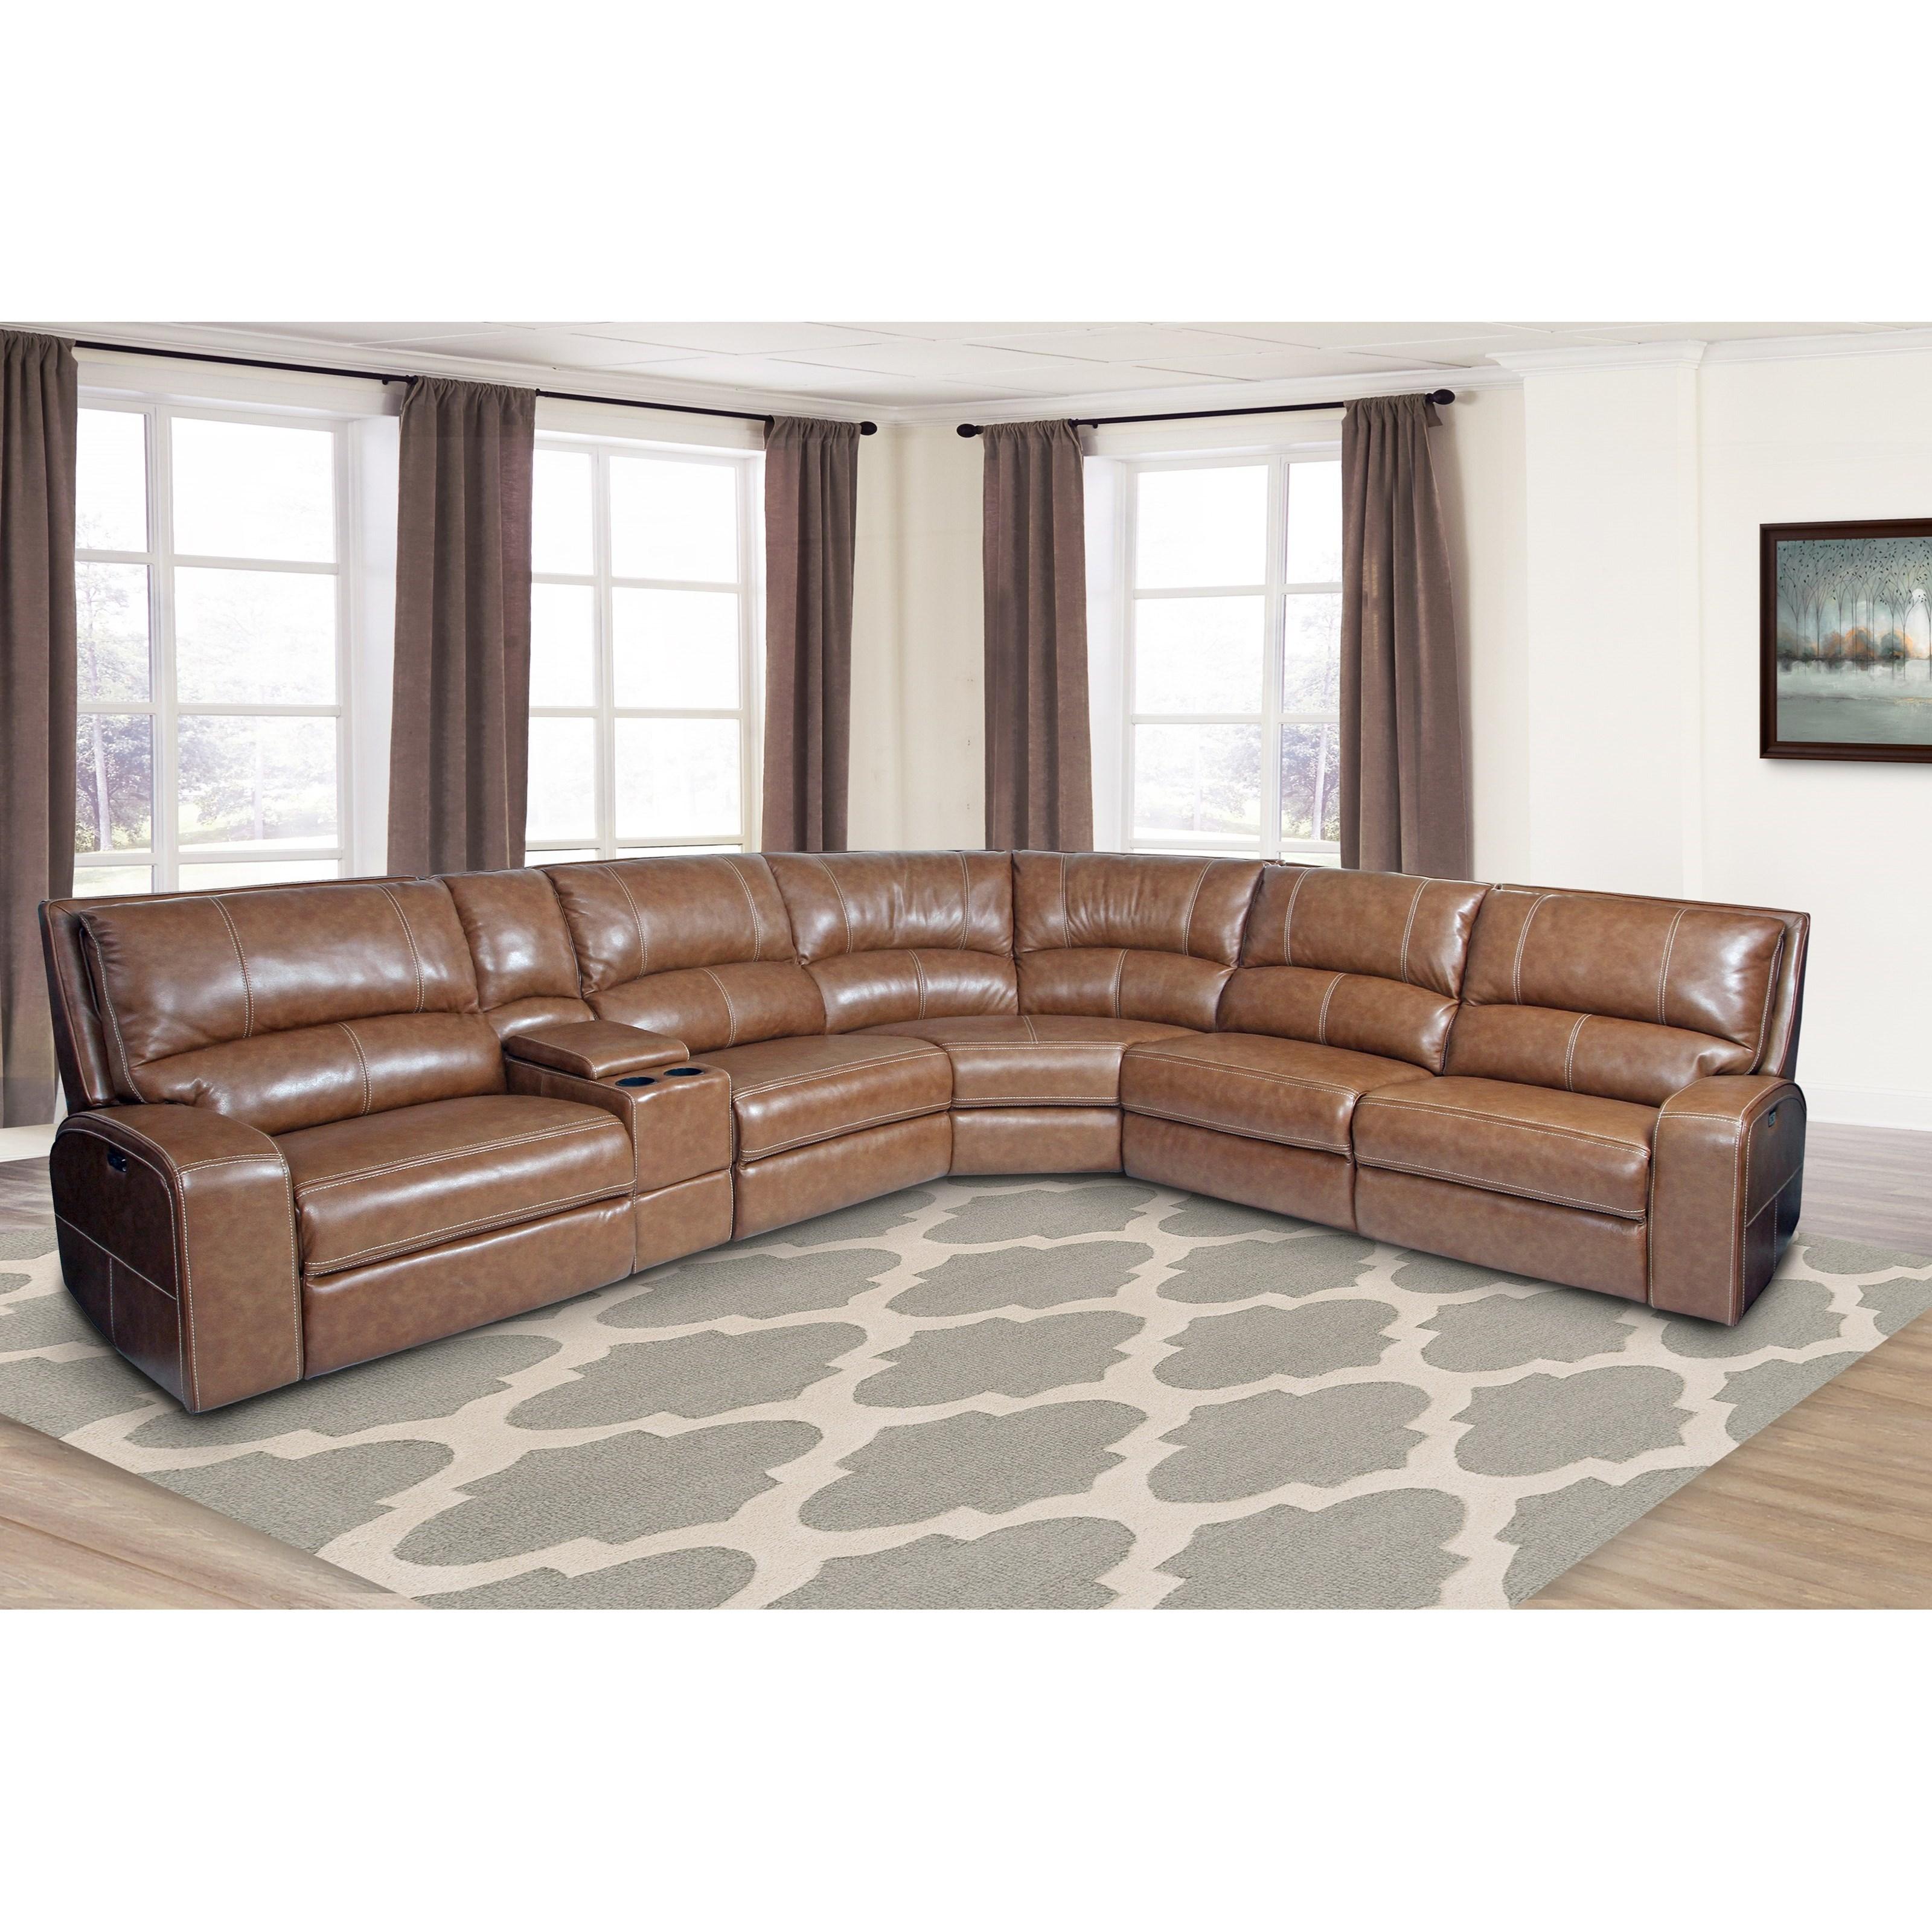 Parker Living SwiftPower Reclining Sectional Sofa